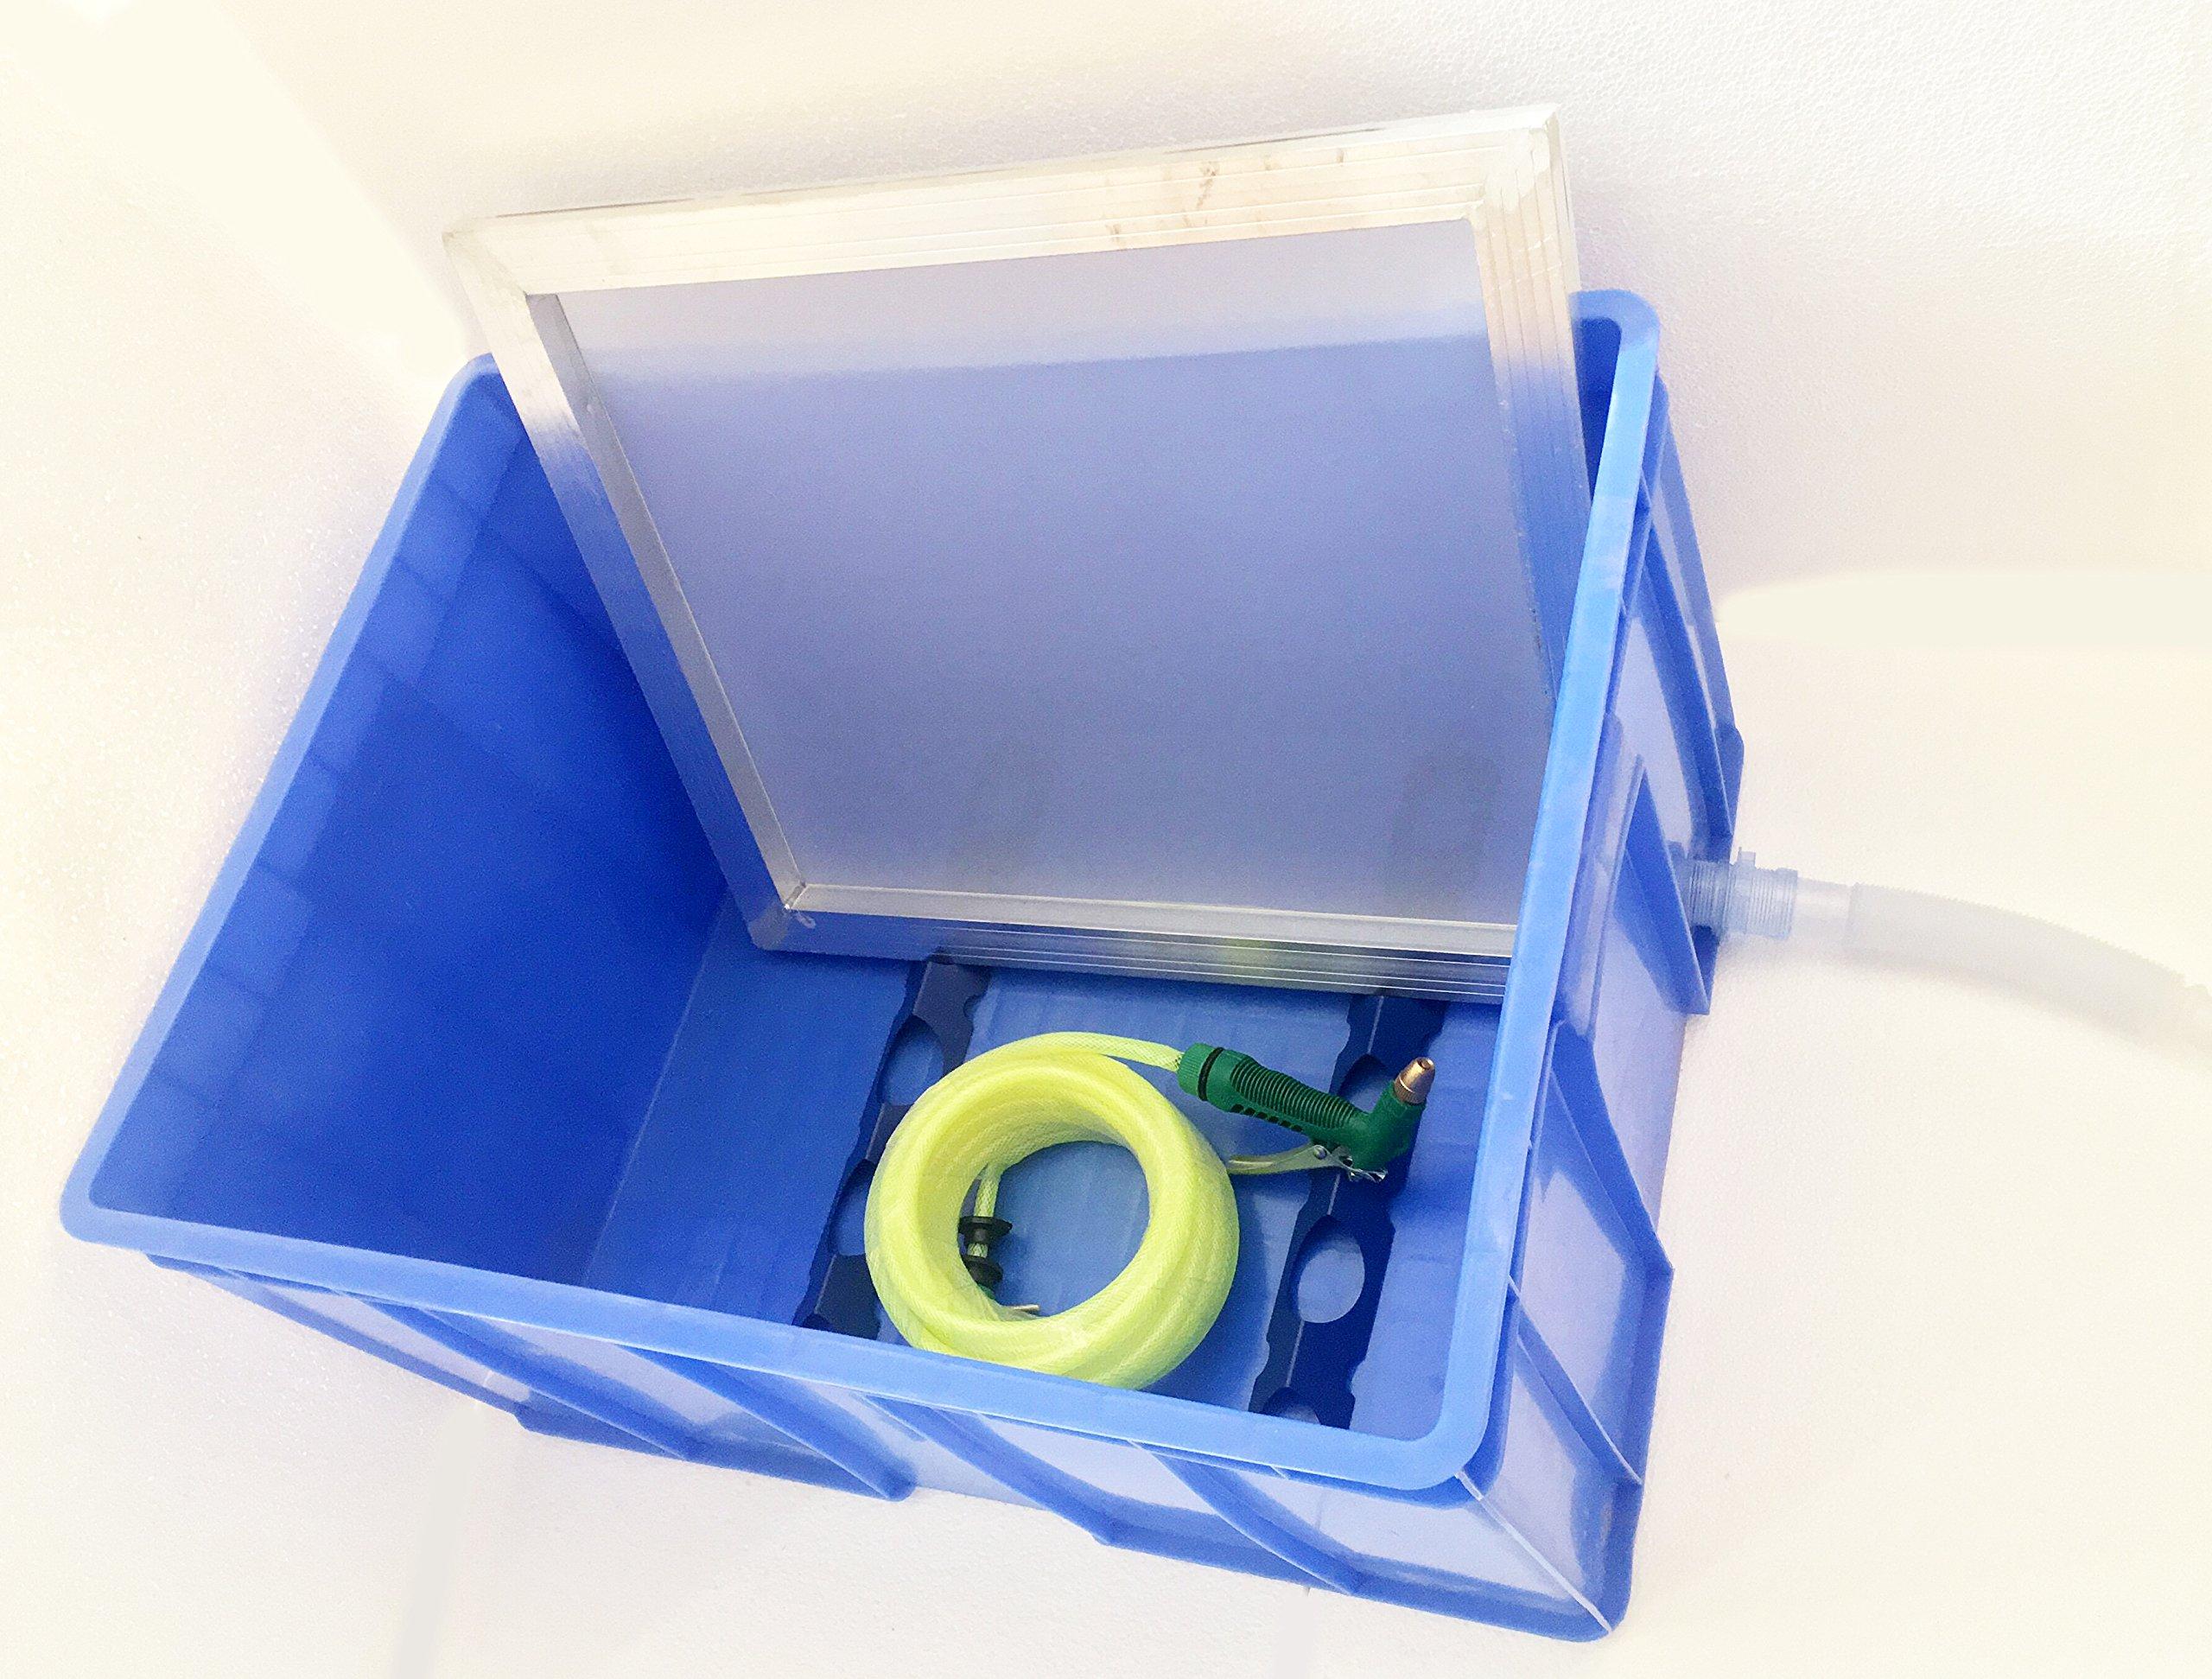 Techtongda Screen Printing Washout Booth Tank Screen Washing by Screen Printing Equipment